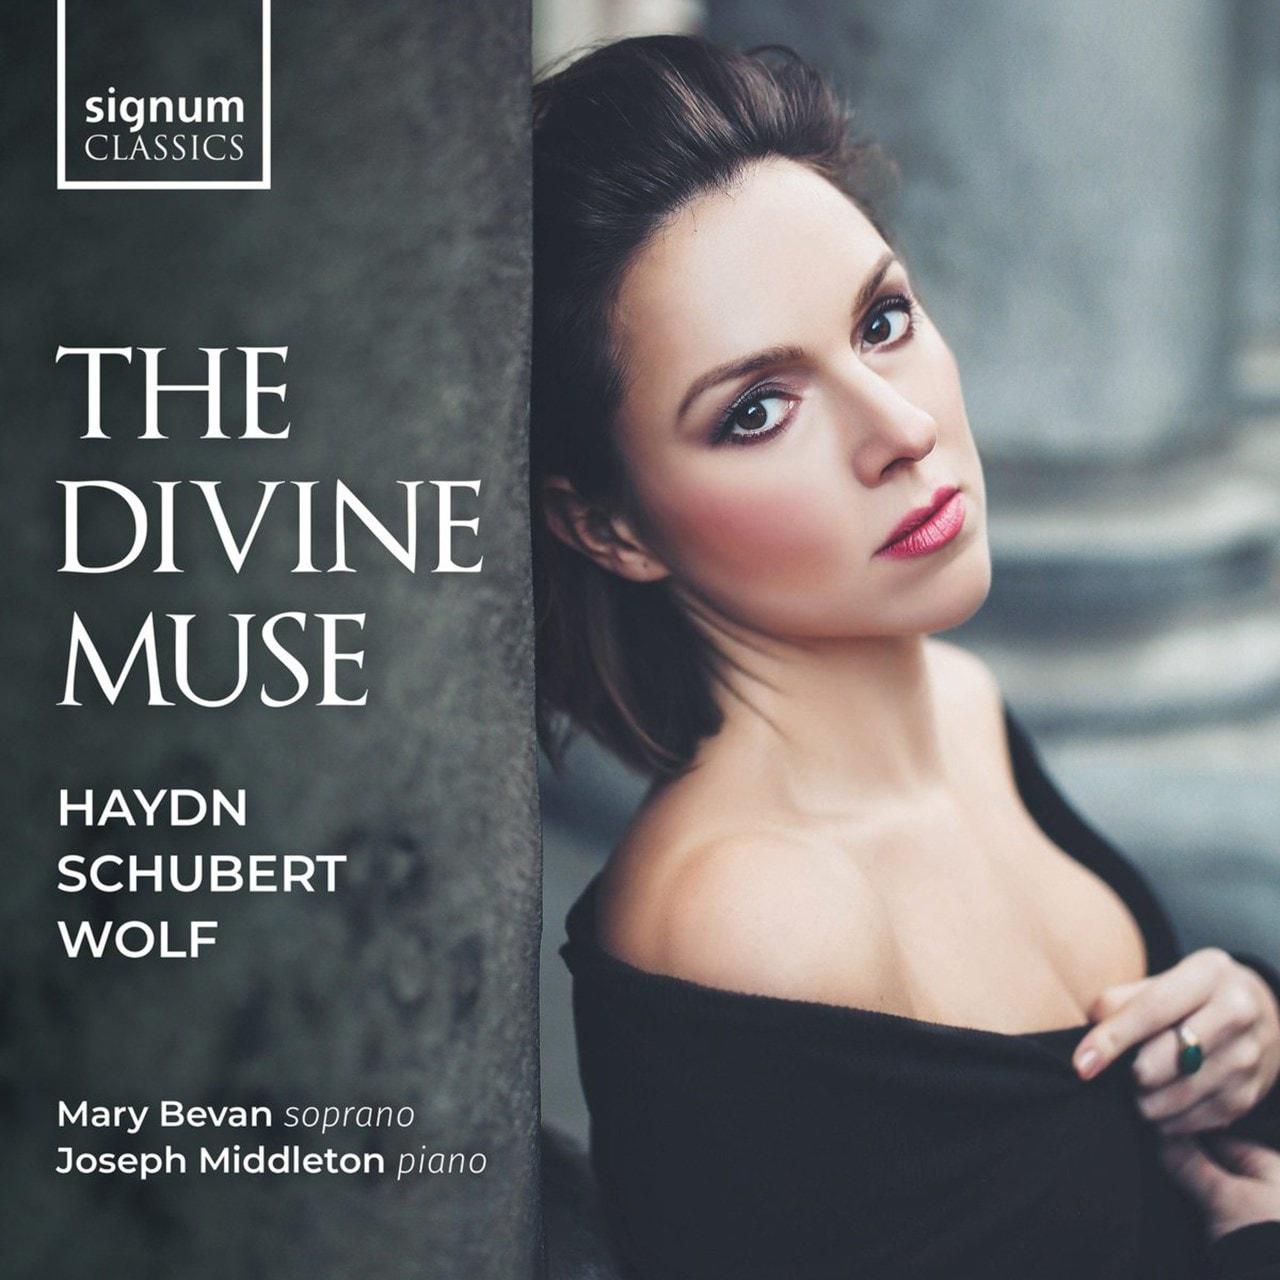 Mary Bevan/Joseph Middleton: The Divine Muse - 1